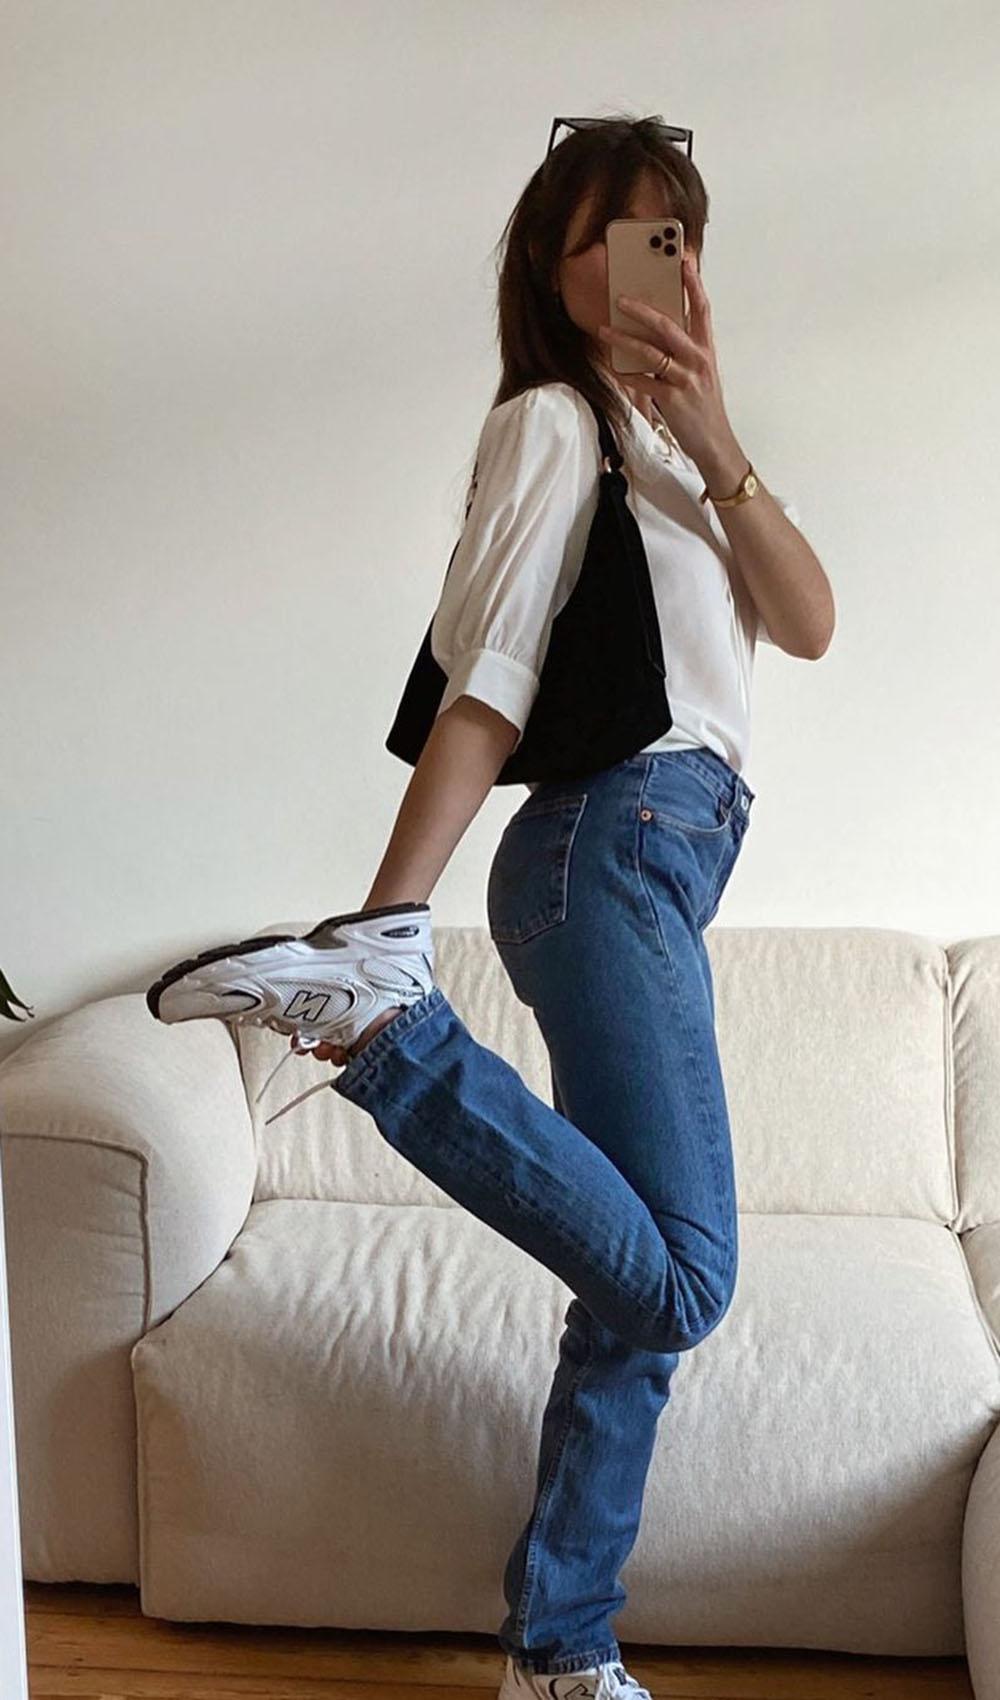 New Balance branco, camisa branca, mom jeans e bolsa baguete preta